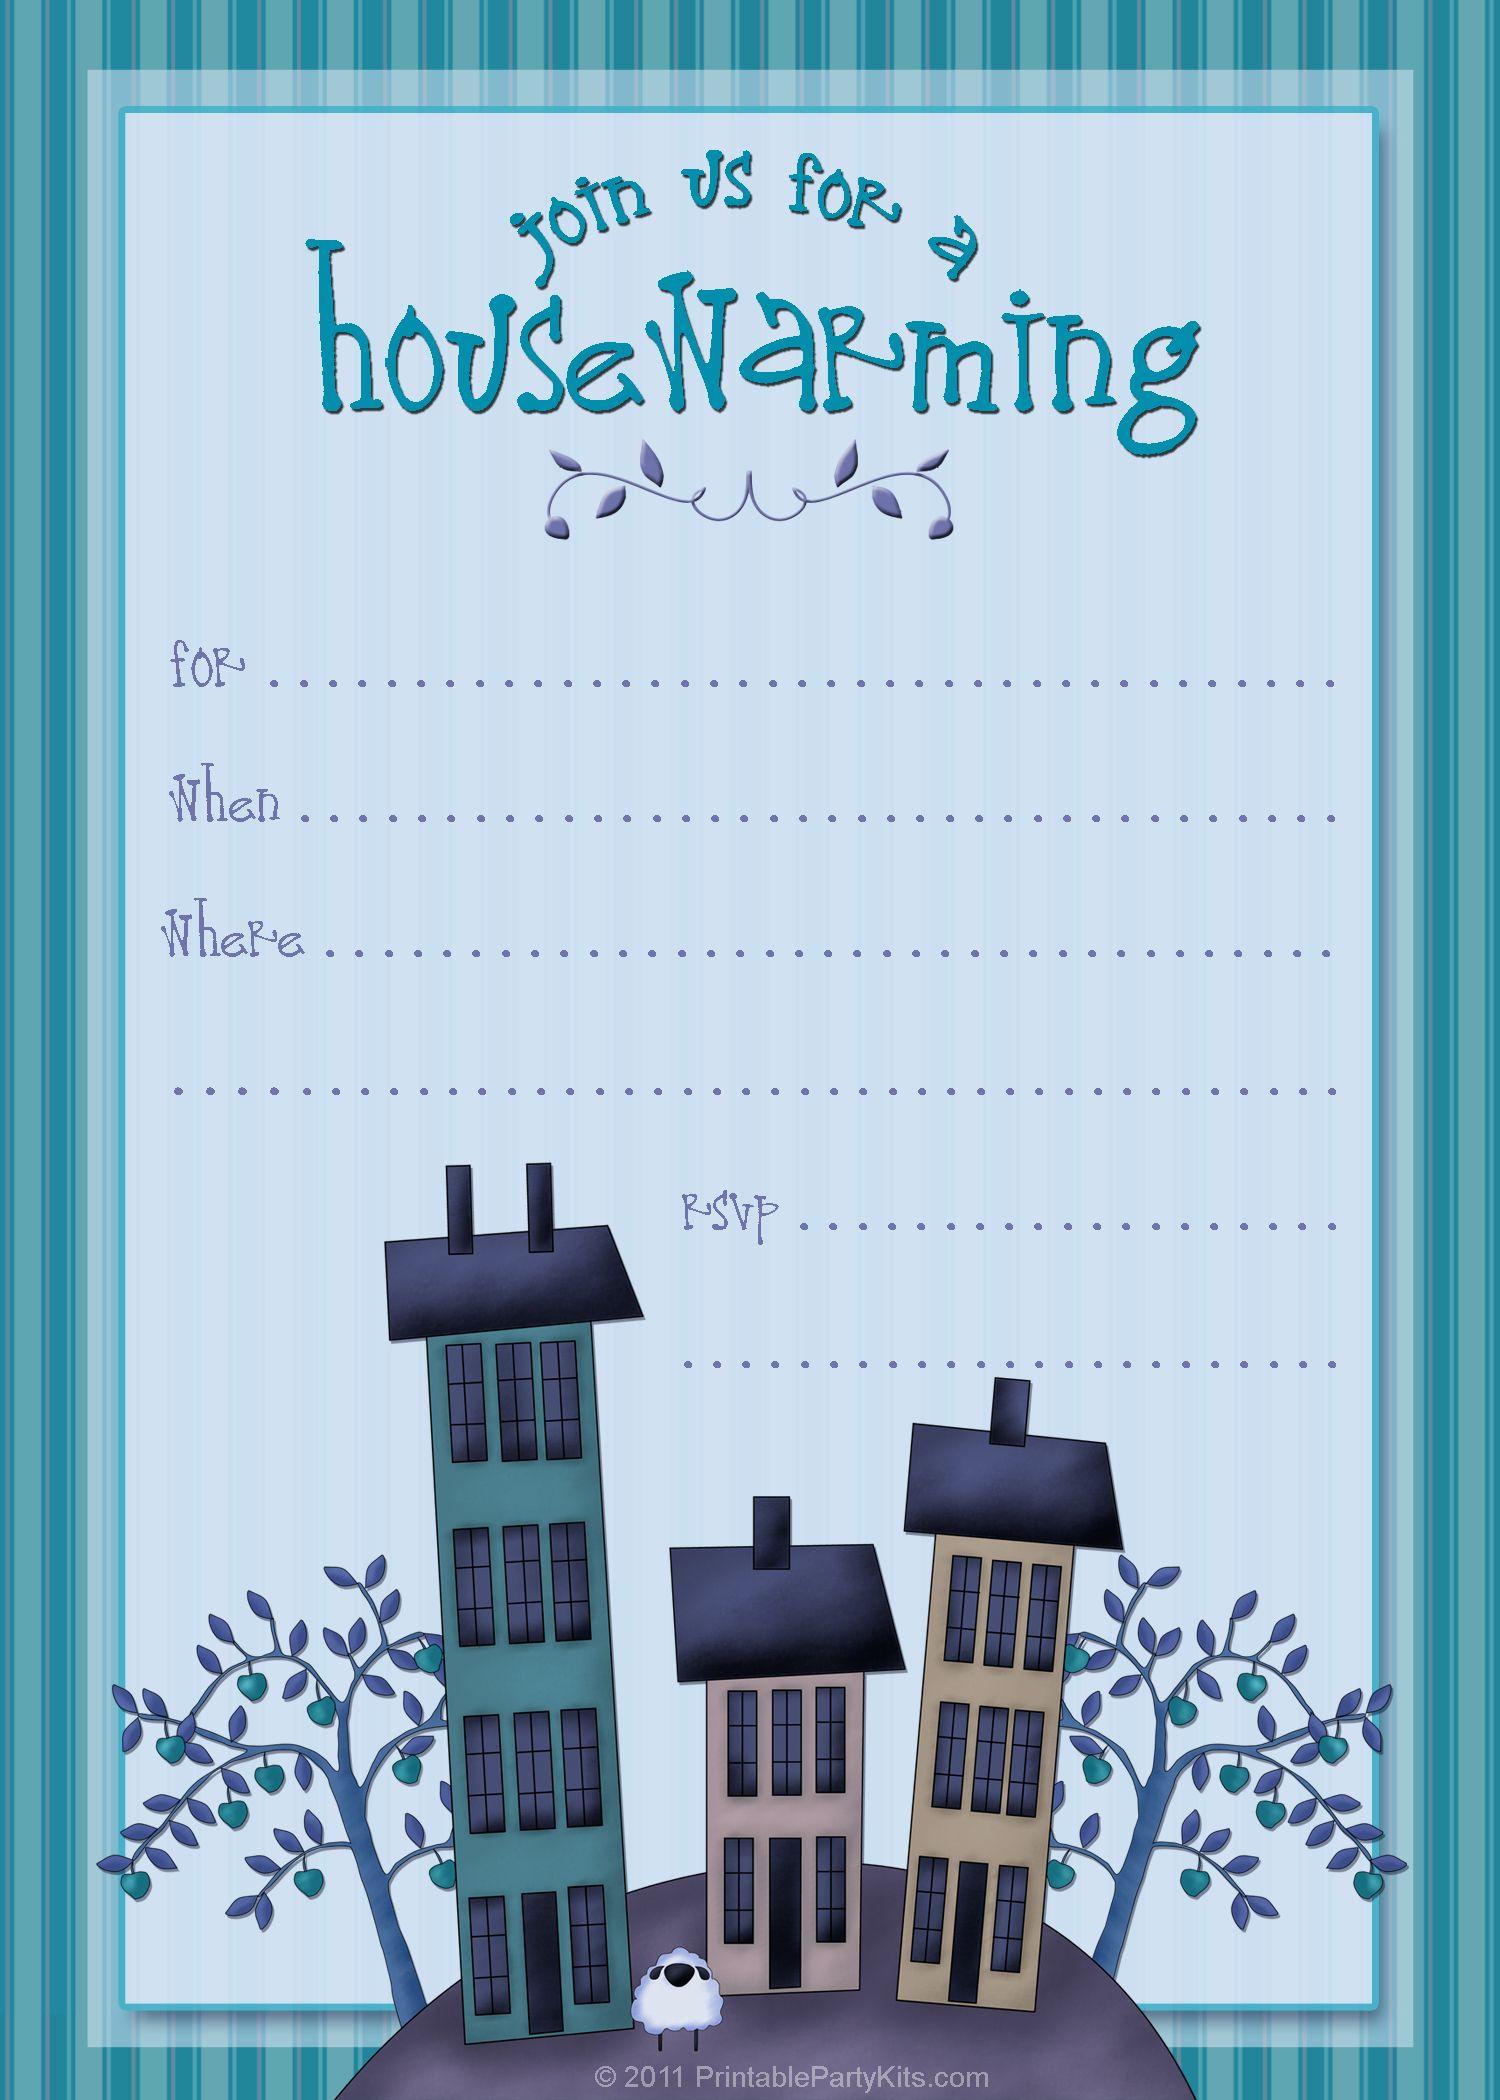 Housewarming Invite Template | Tanveer | Pinterest | Housewarming - Free Printable Housewarming Invitations Cards